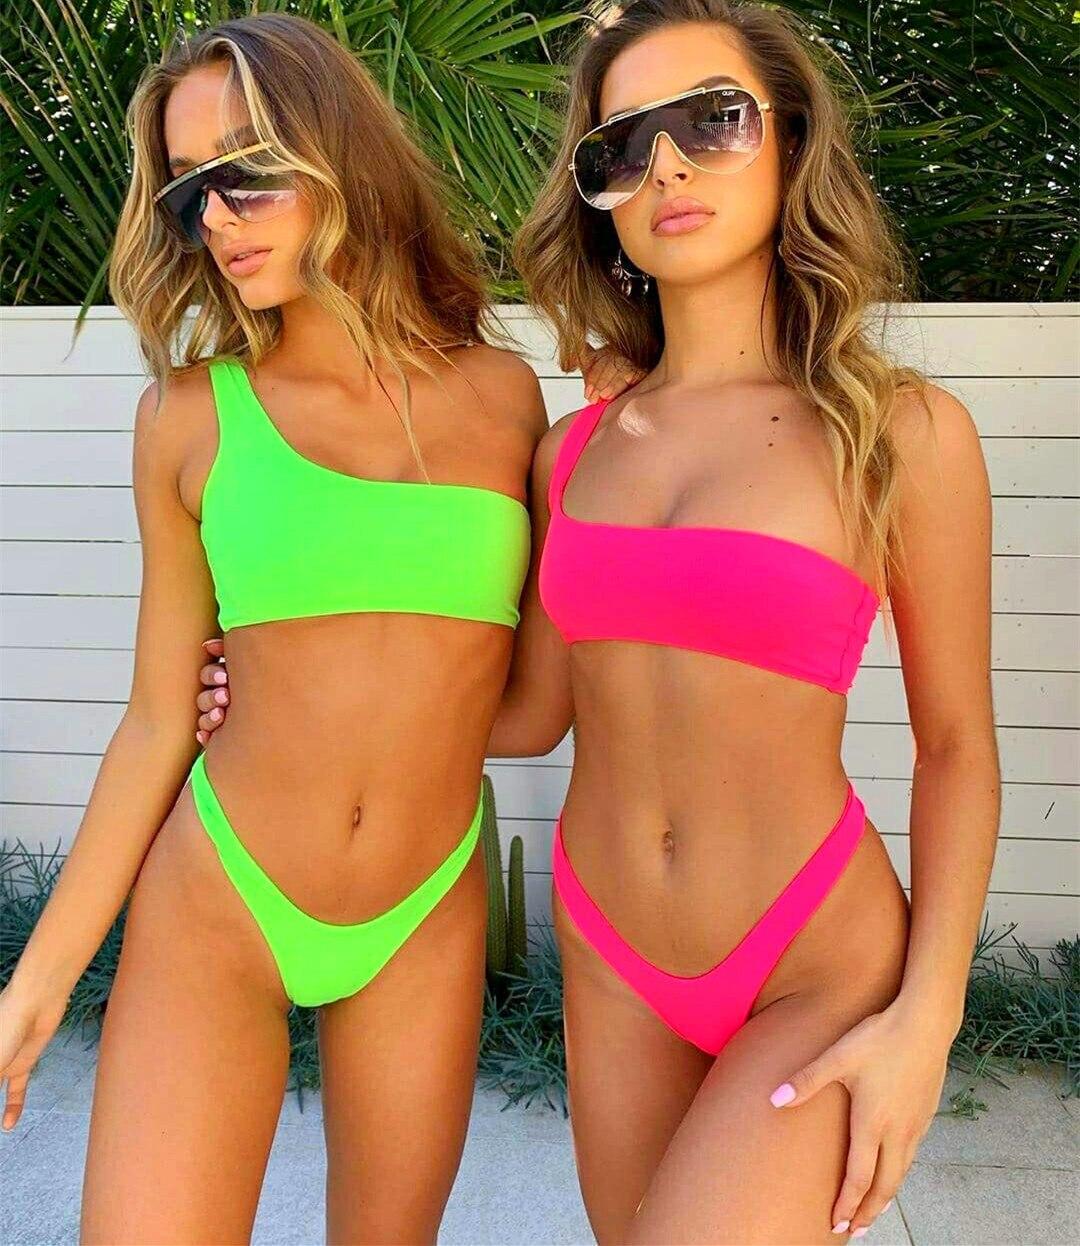 Bathing Suit Swimwear Swimsuit Bathers Thong Bikini Sexy Neon Green Female Women Biquini Low Waist Bikinis Set Fits True To